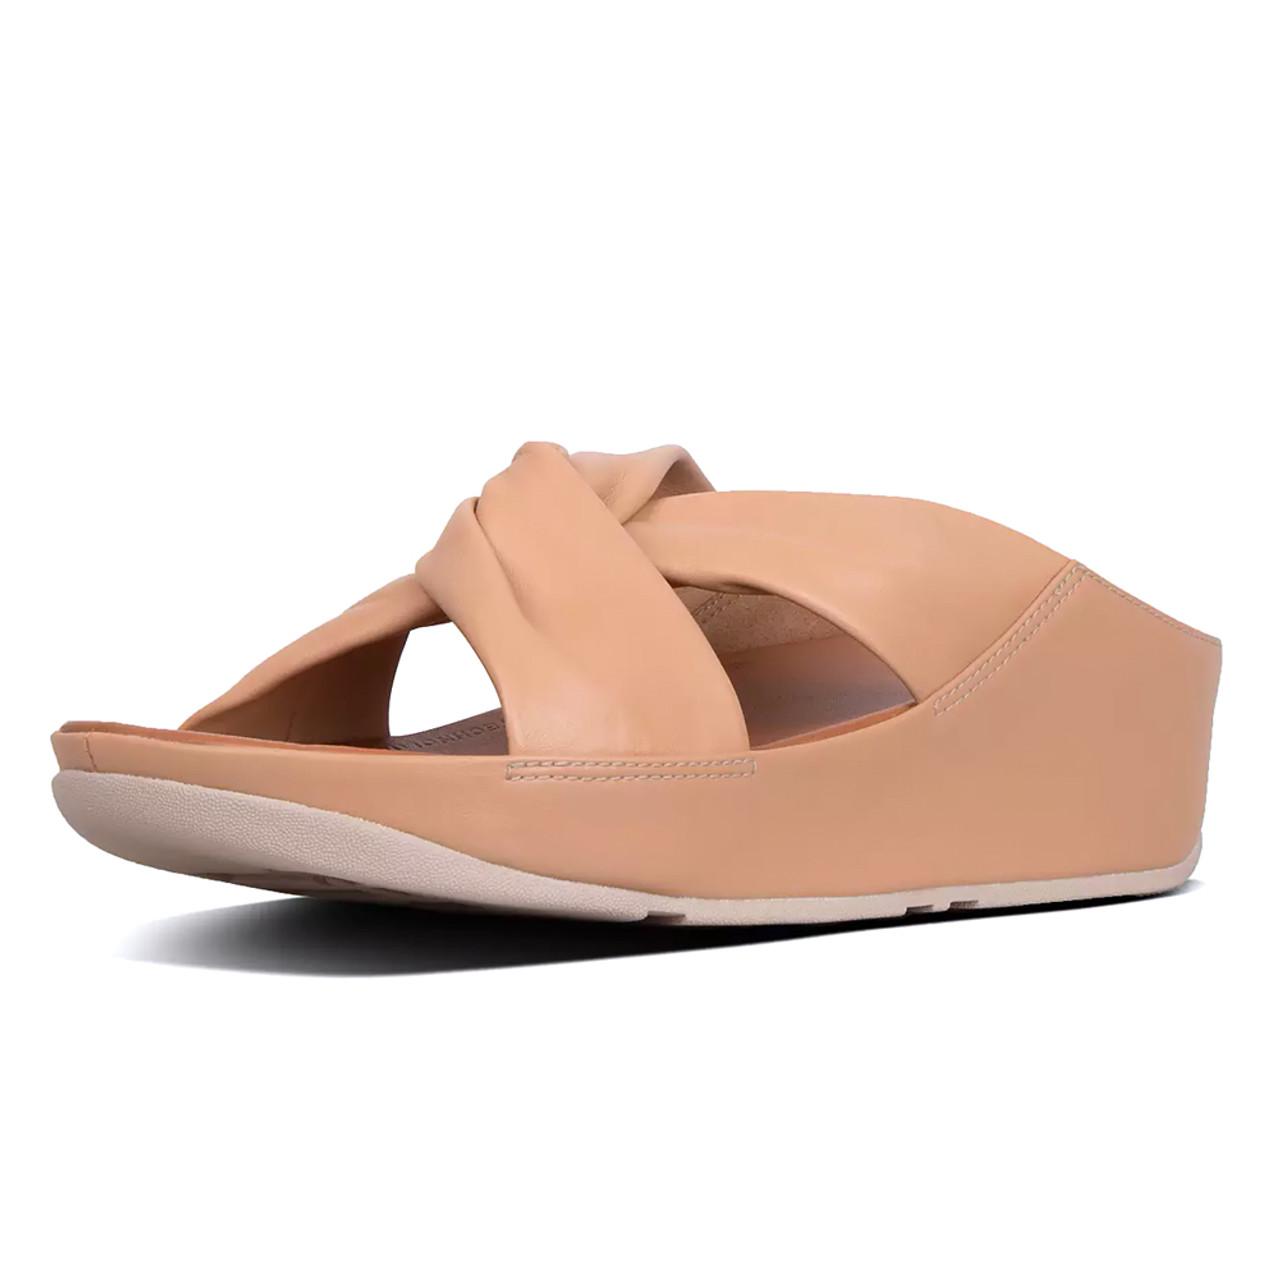 a9095f224 Fitflop Women s Twiss Slide Sandals Blush - Shop now   Shoolu.com